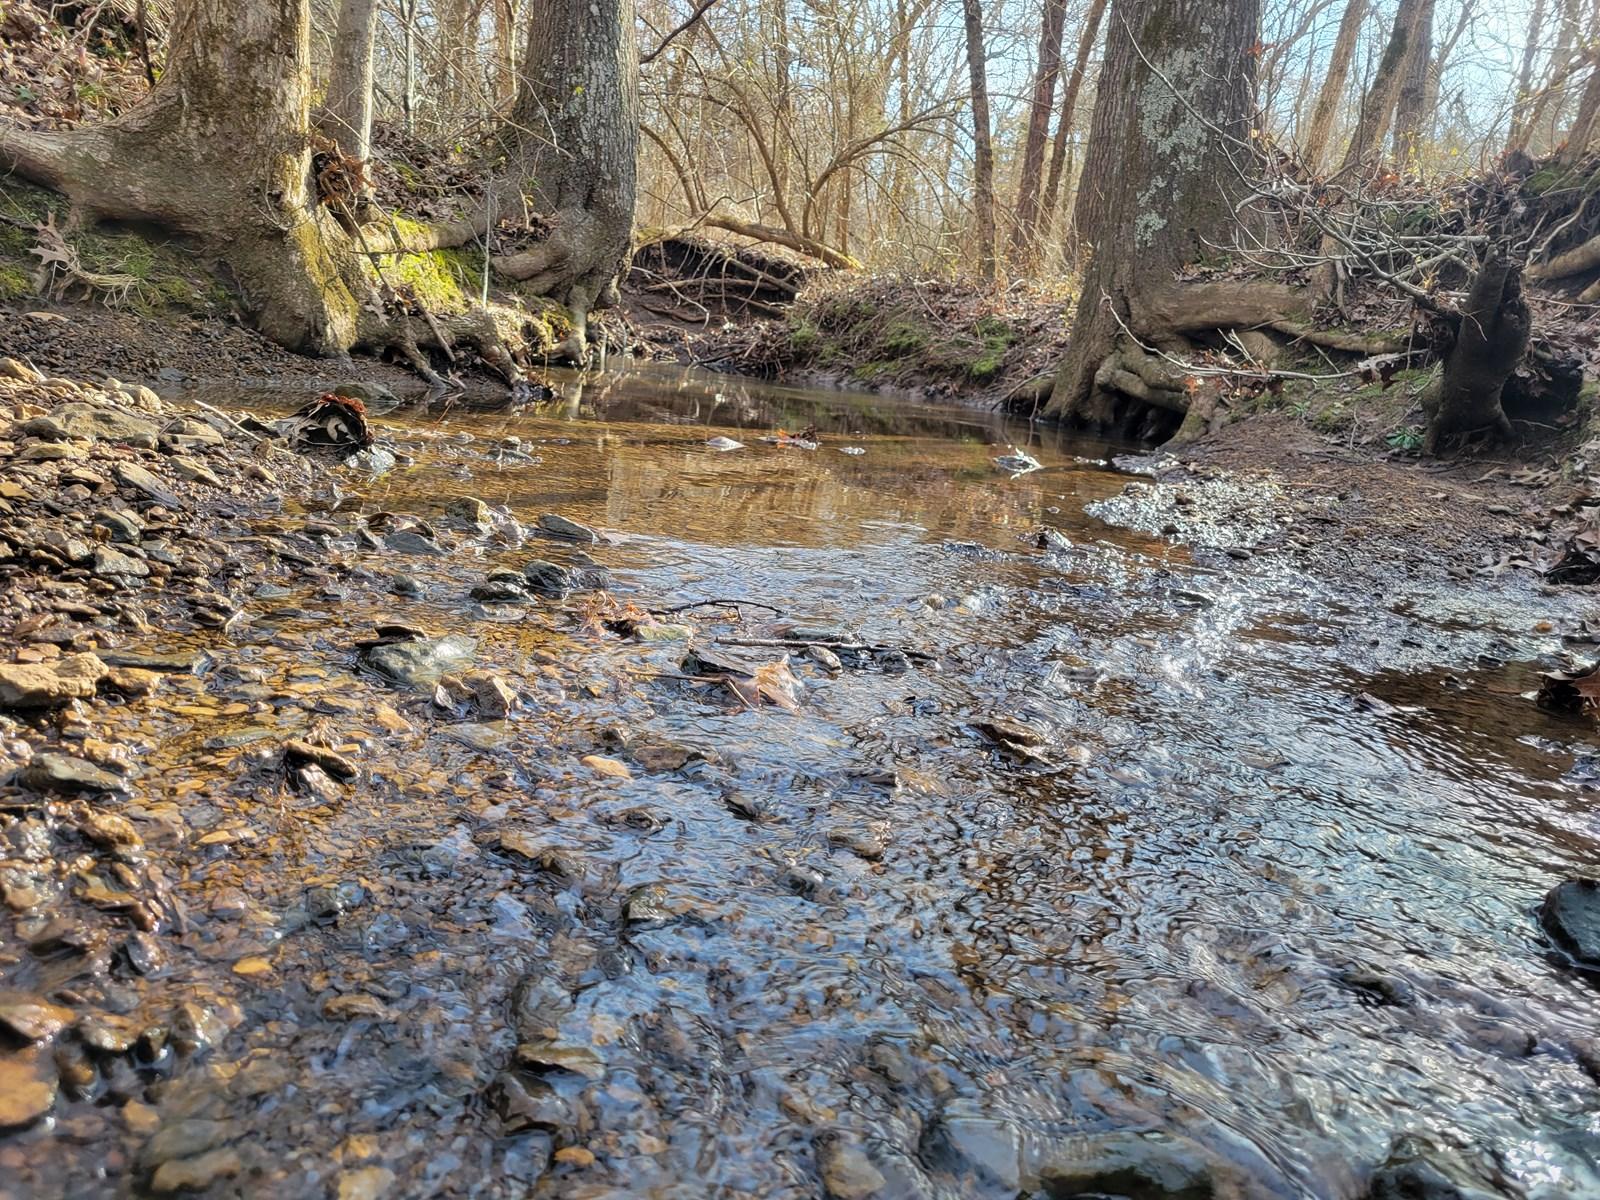 Land for sale Barton County MO